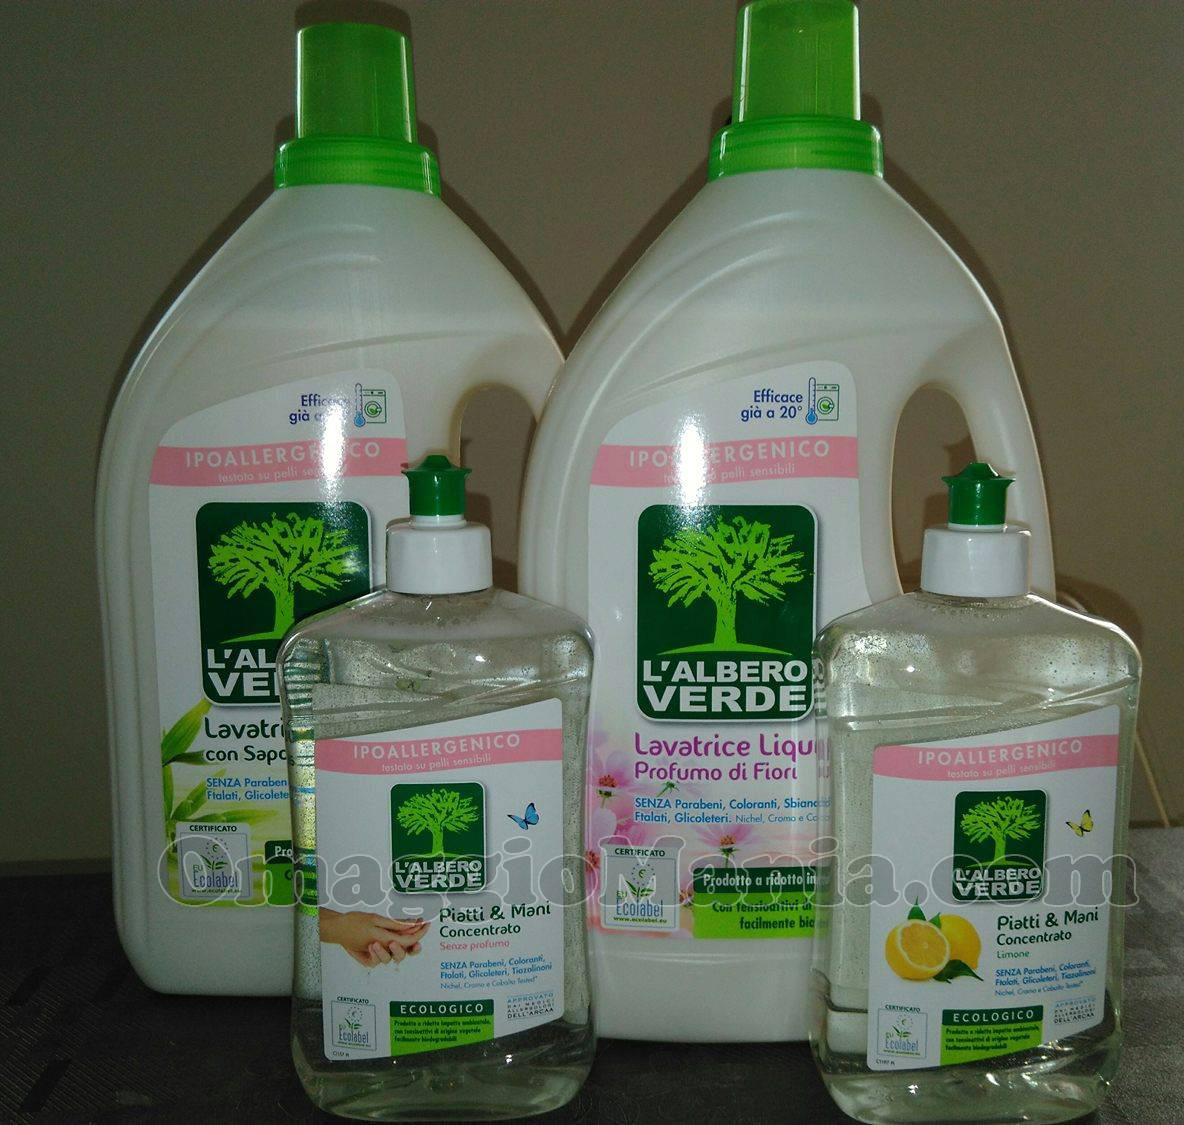 kit L'Albero Verde ricevuto da Gloria